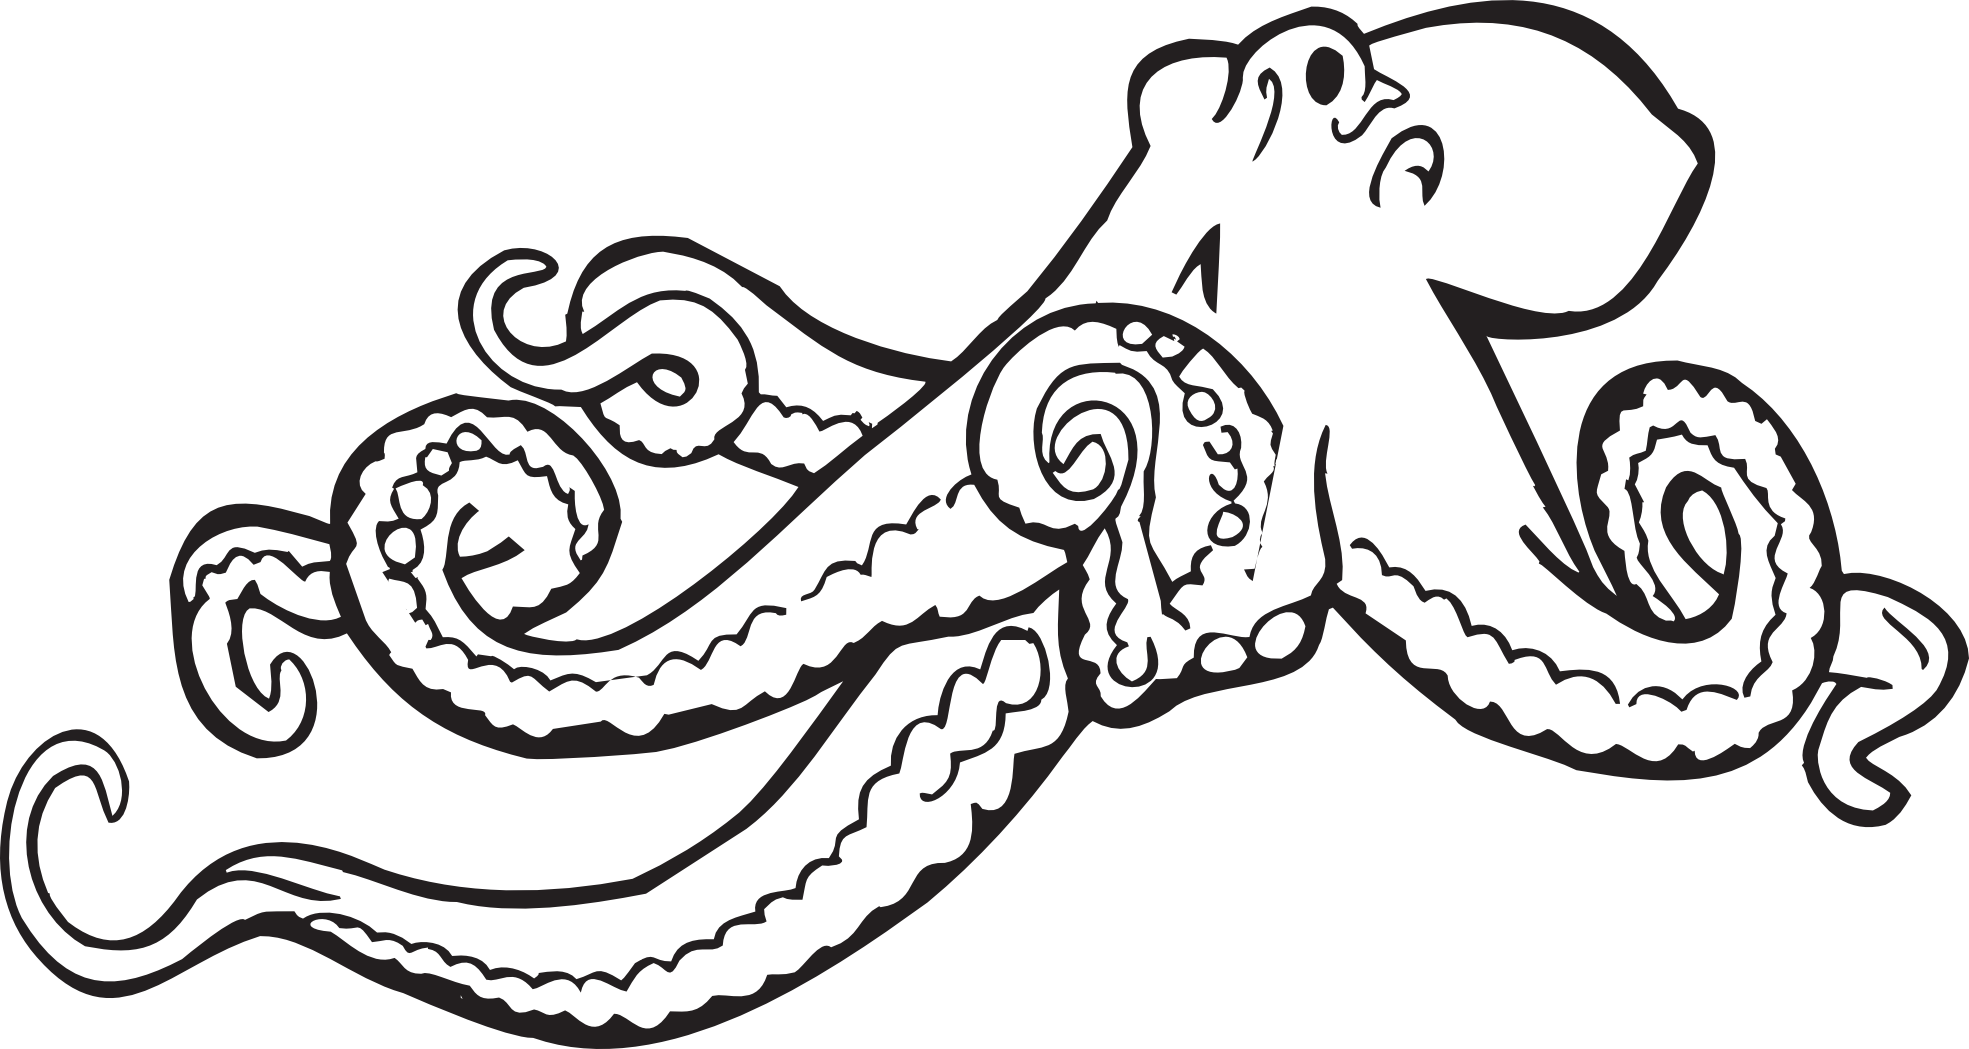 Black Octopus Drawing Octopus Clipart Black